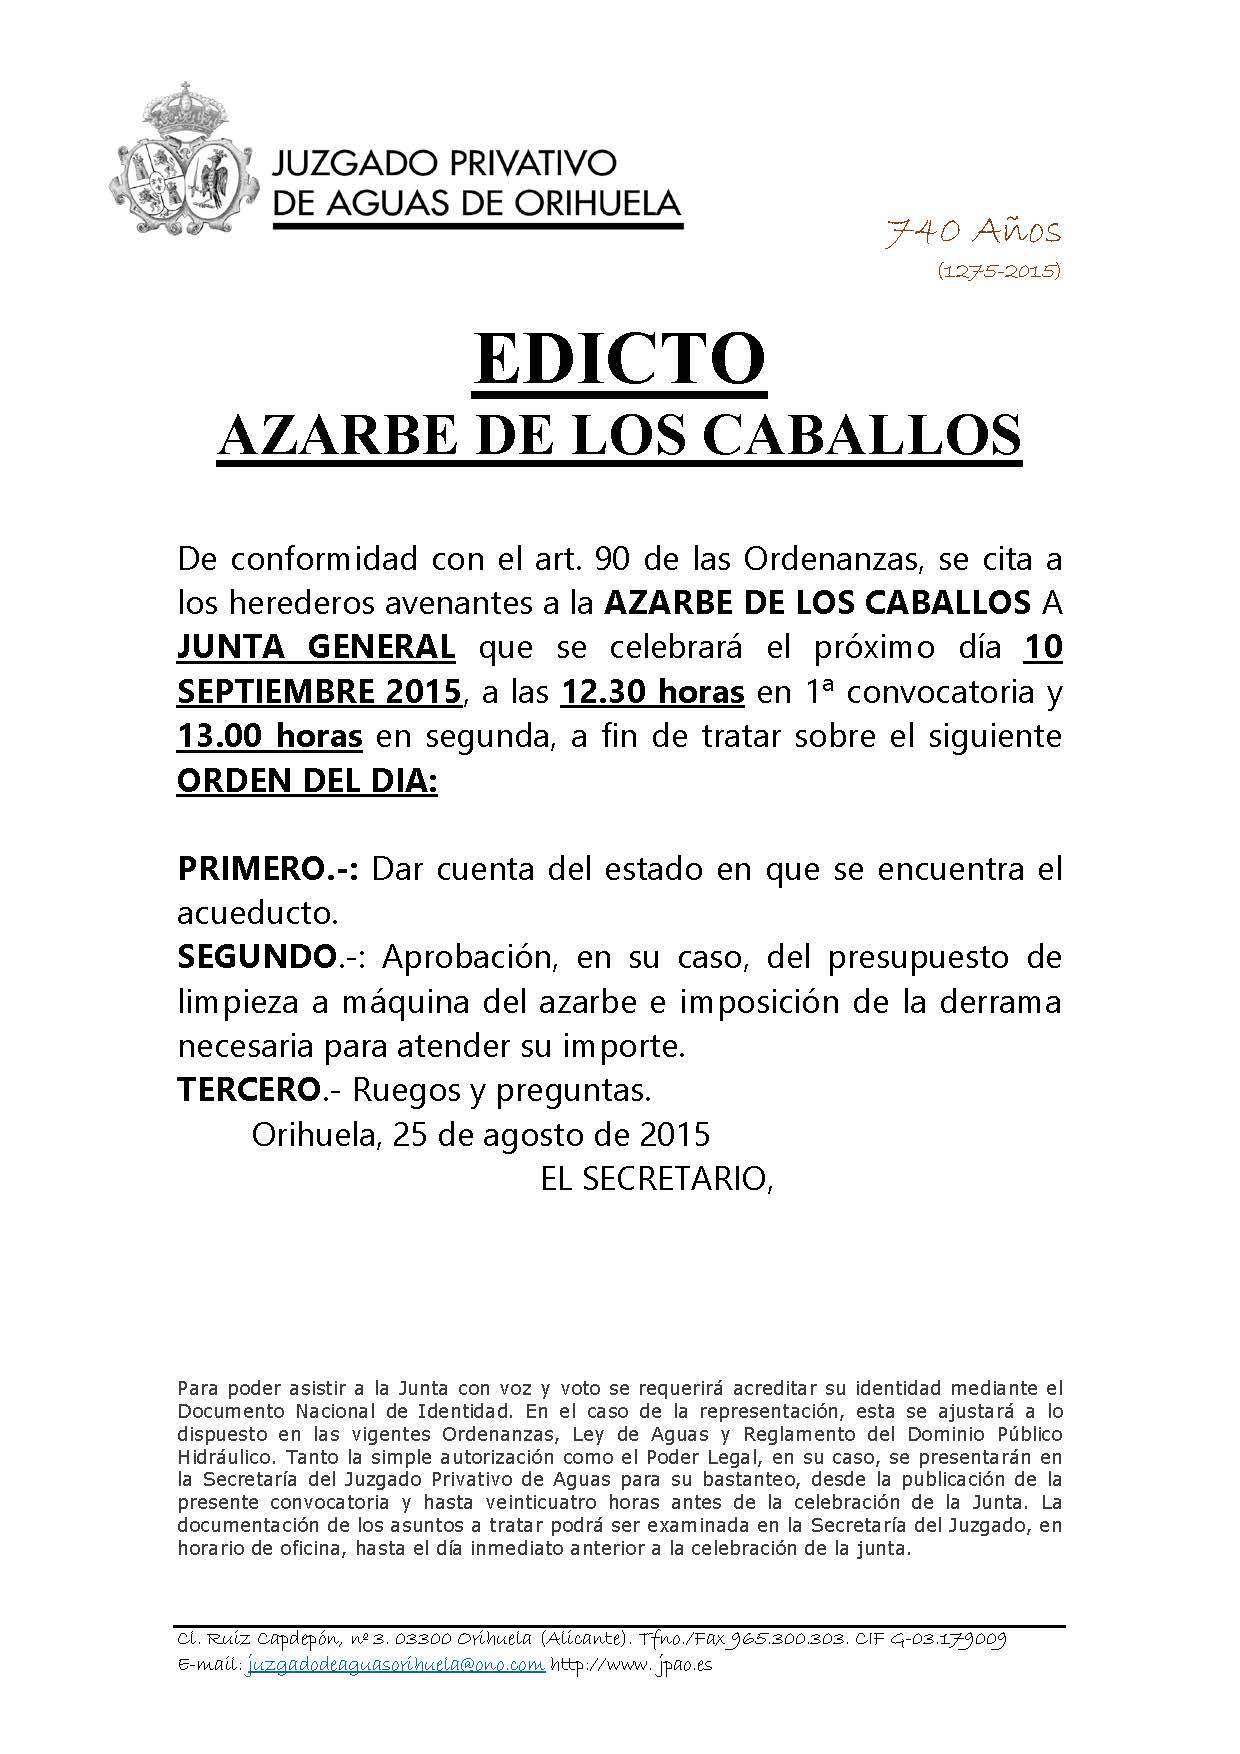 ARROBA DE CABALLOS. COMPARECENCIA EDICTO CITACION JUNTA 26082015 1